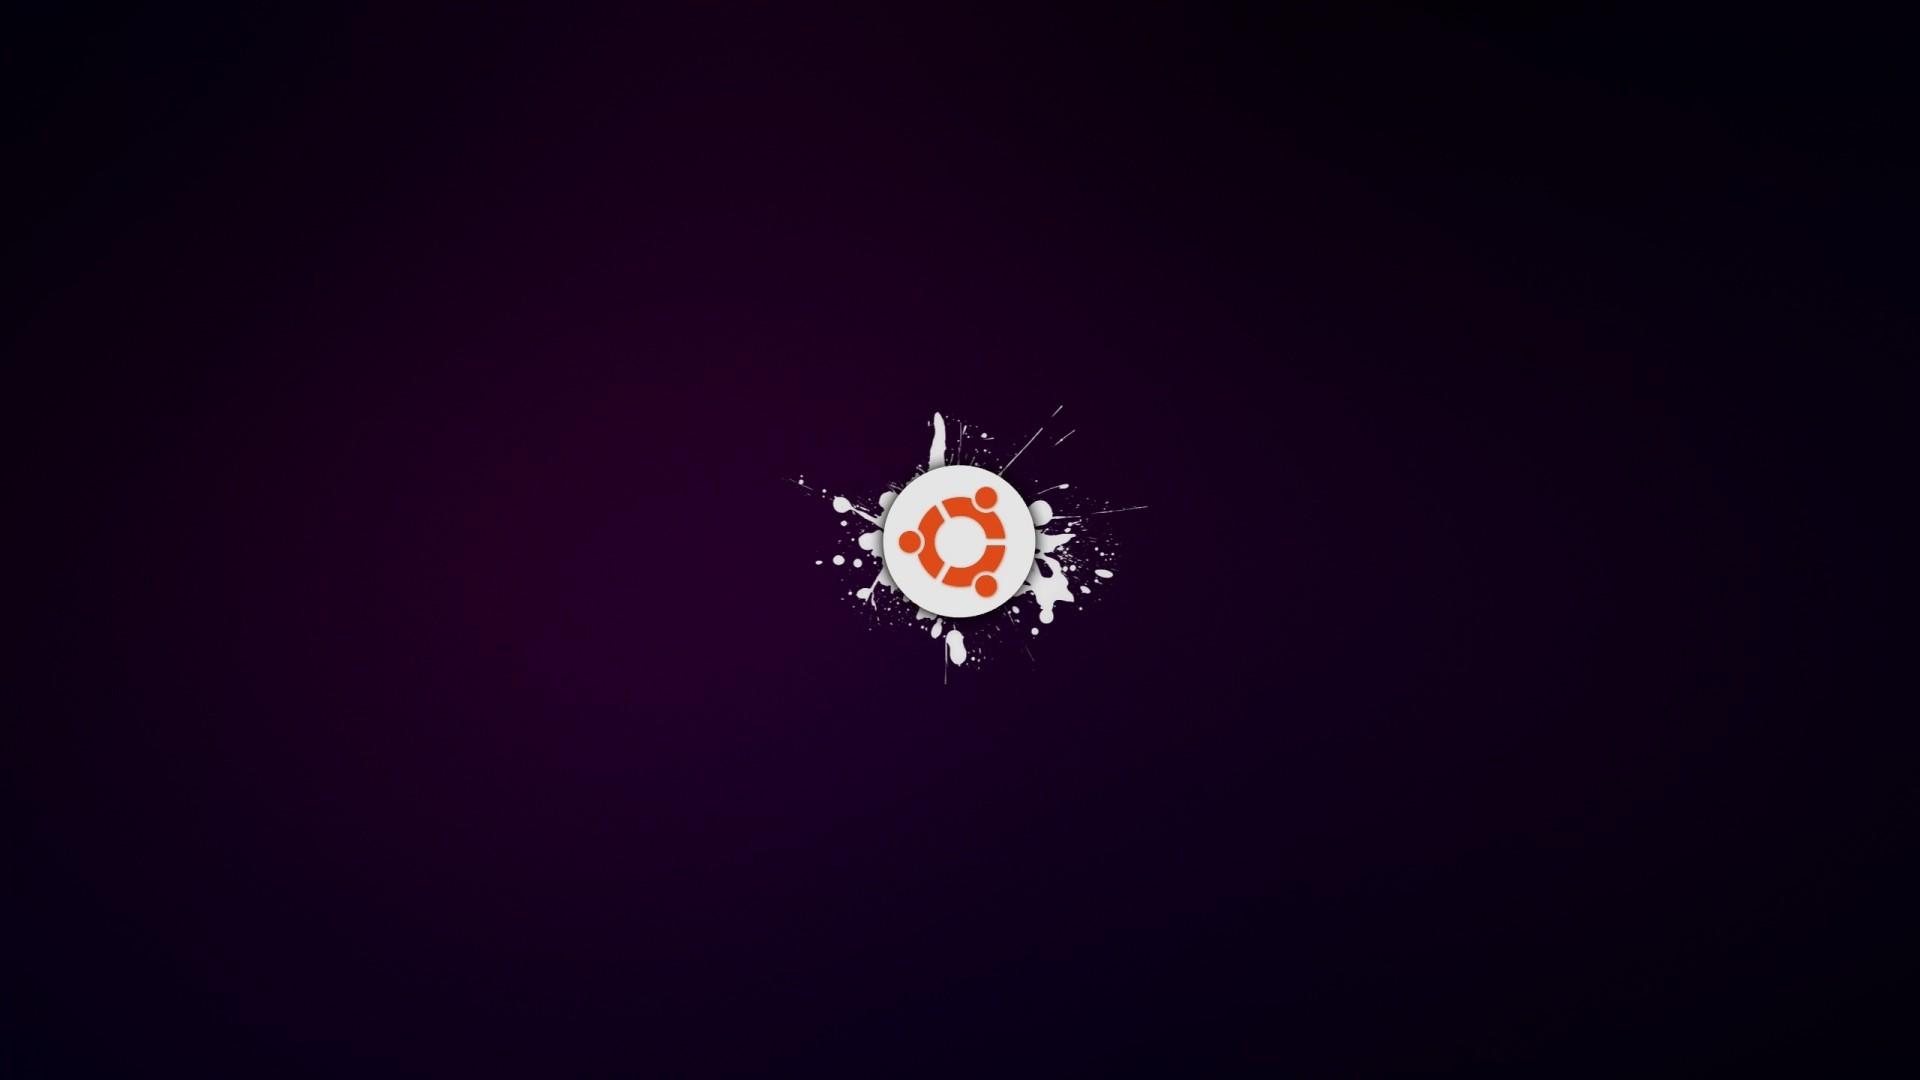 Res: 1920x1080, Full HD Wallpaper ubuntu linux logo spray